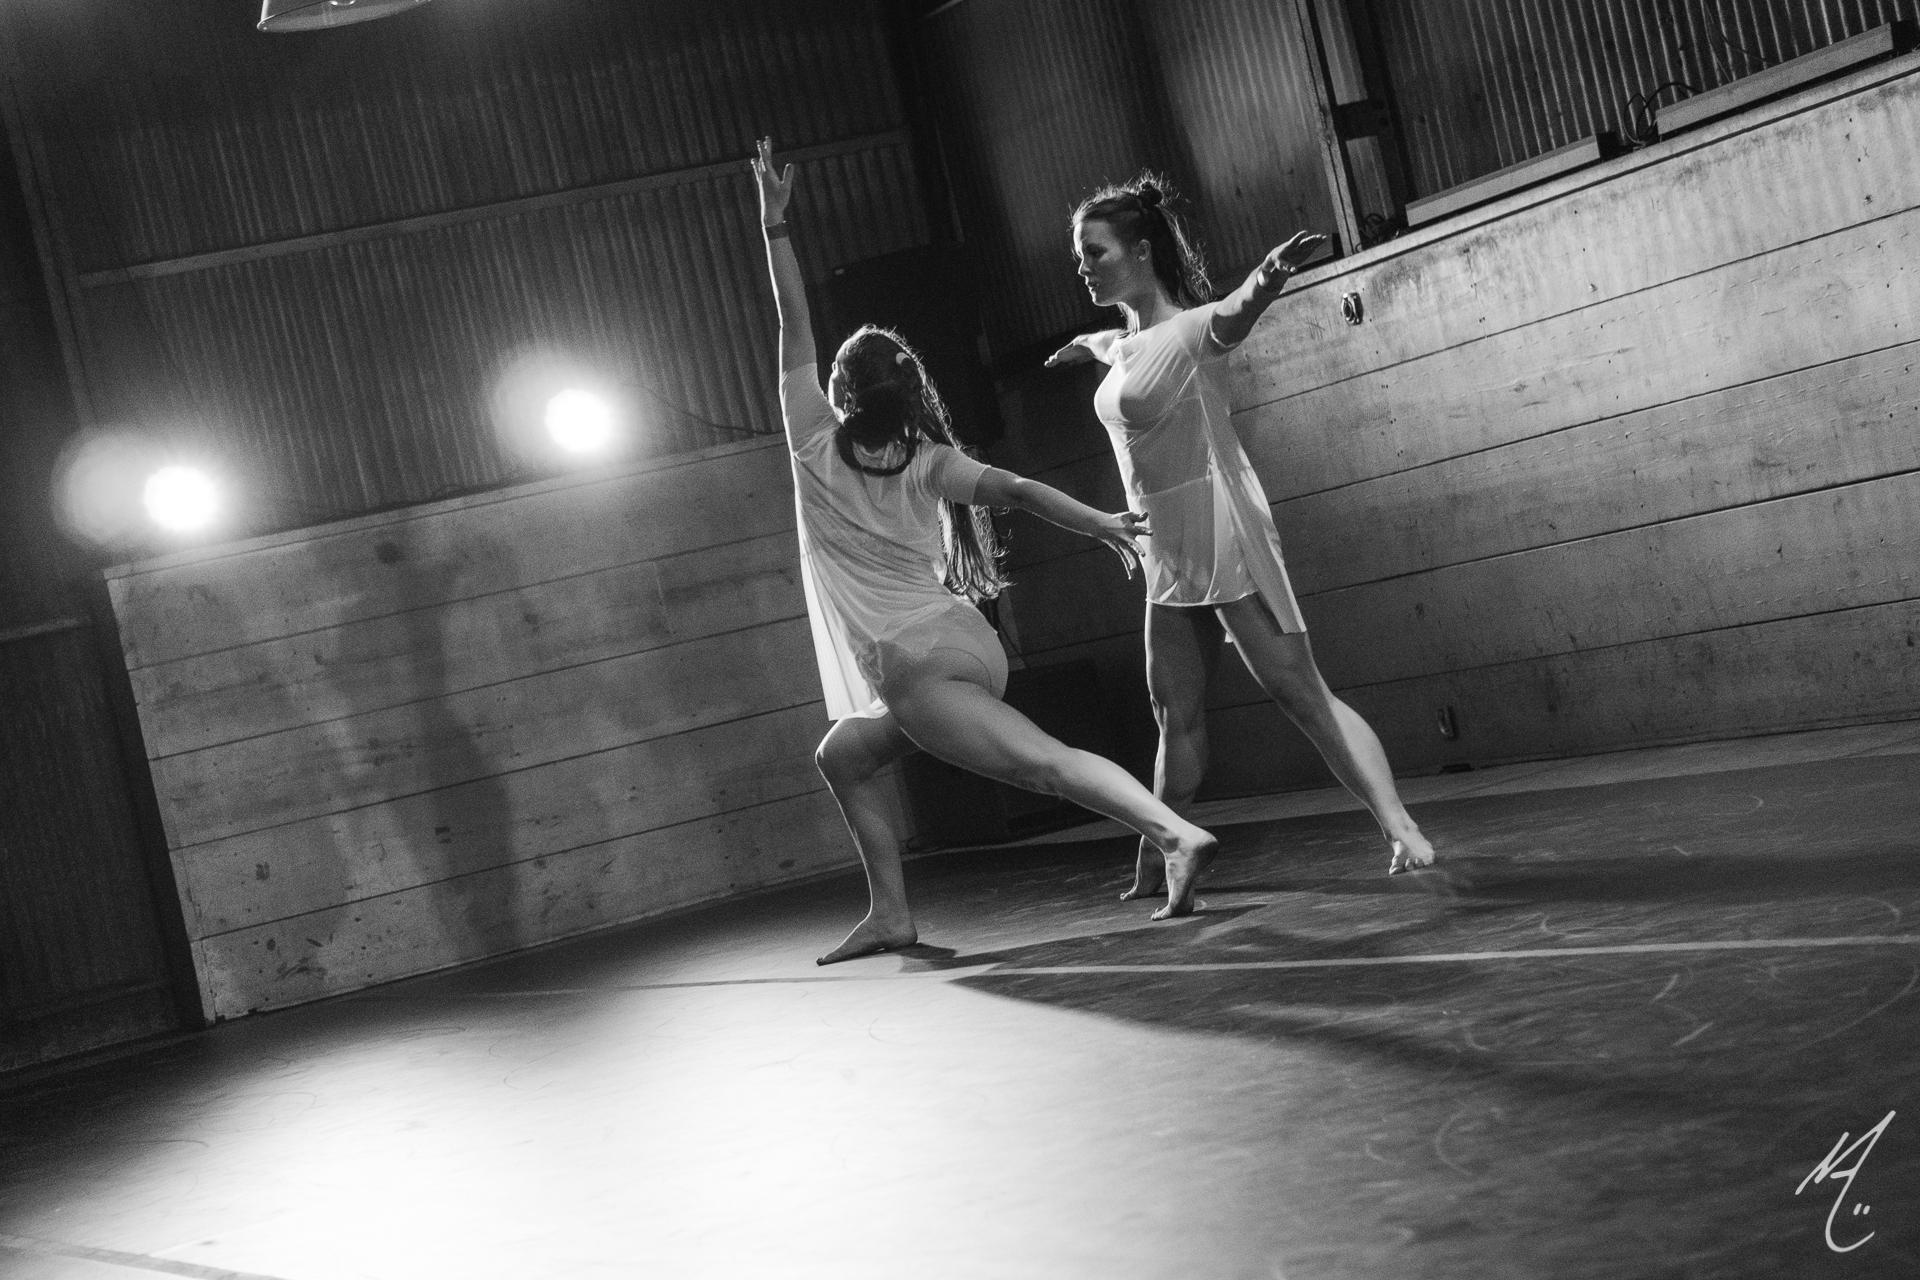 Dancers: Lucy Wilson, Laura Mobley